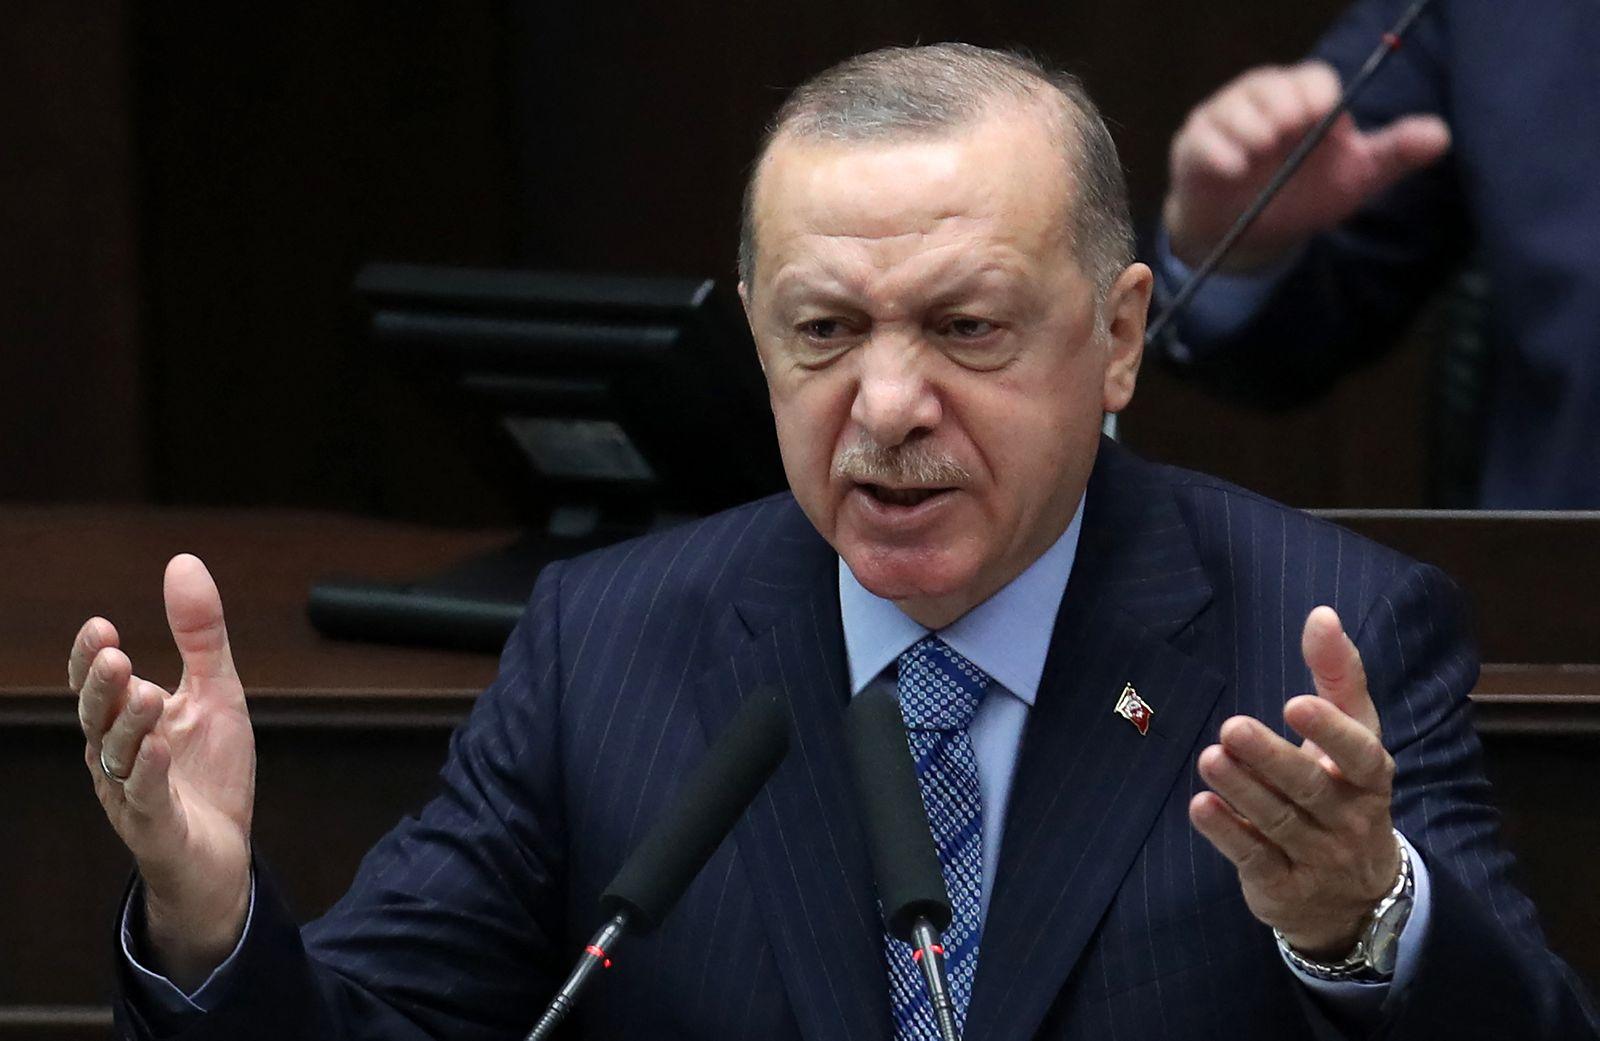 TURKEY-POLITICS-ASSEMBLY